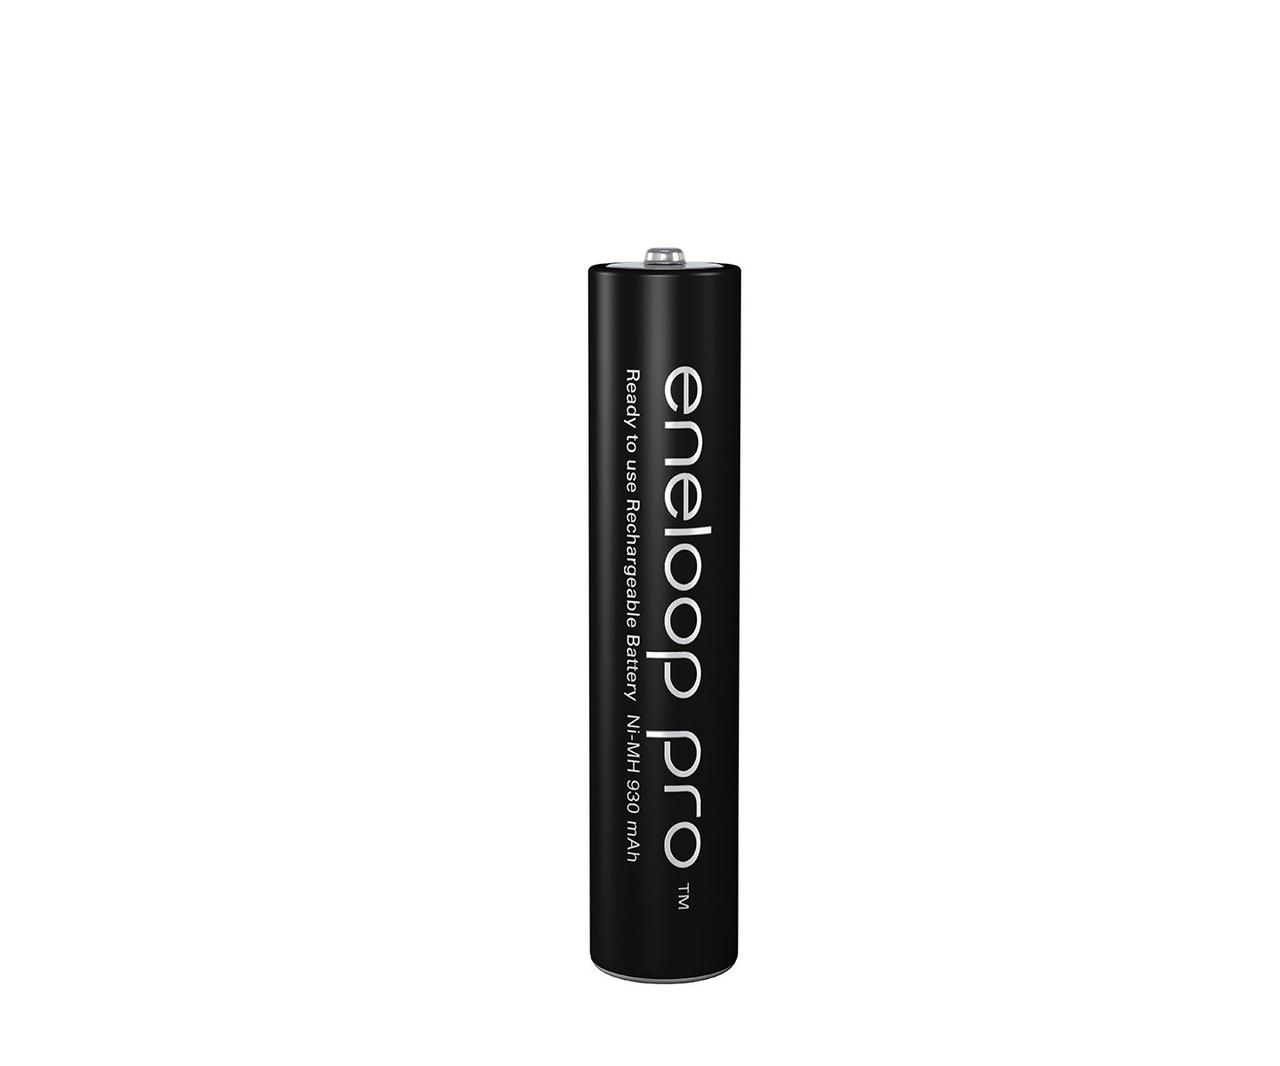 Panasonic Eneloop Pro AAA 950mAh 1,2V батарейка аккумулятор NiMH